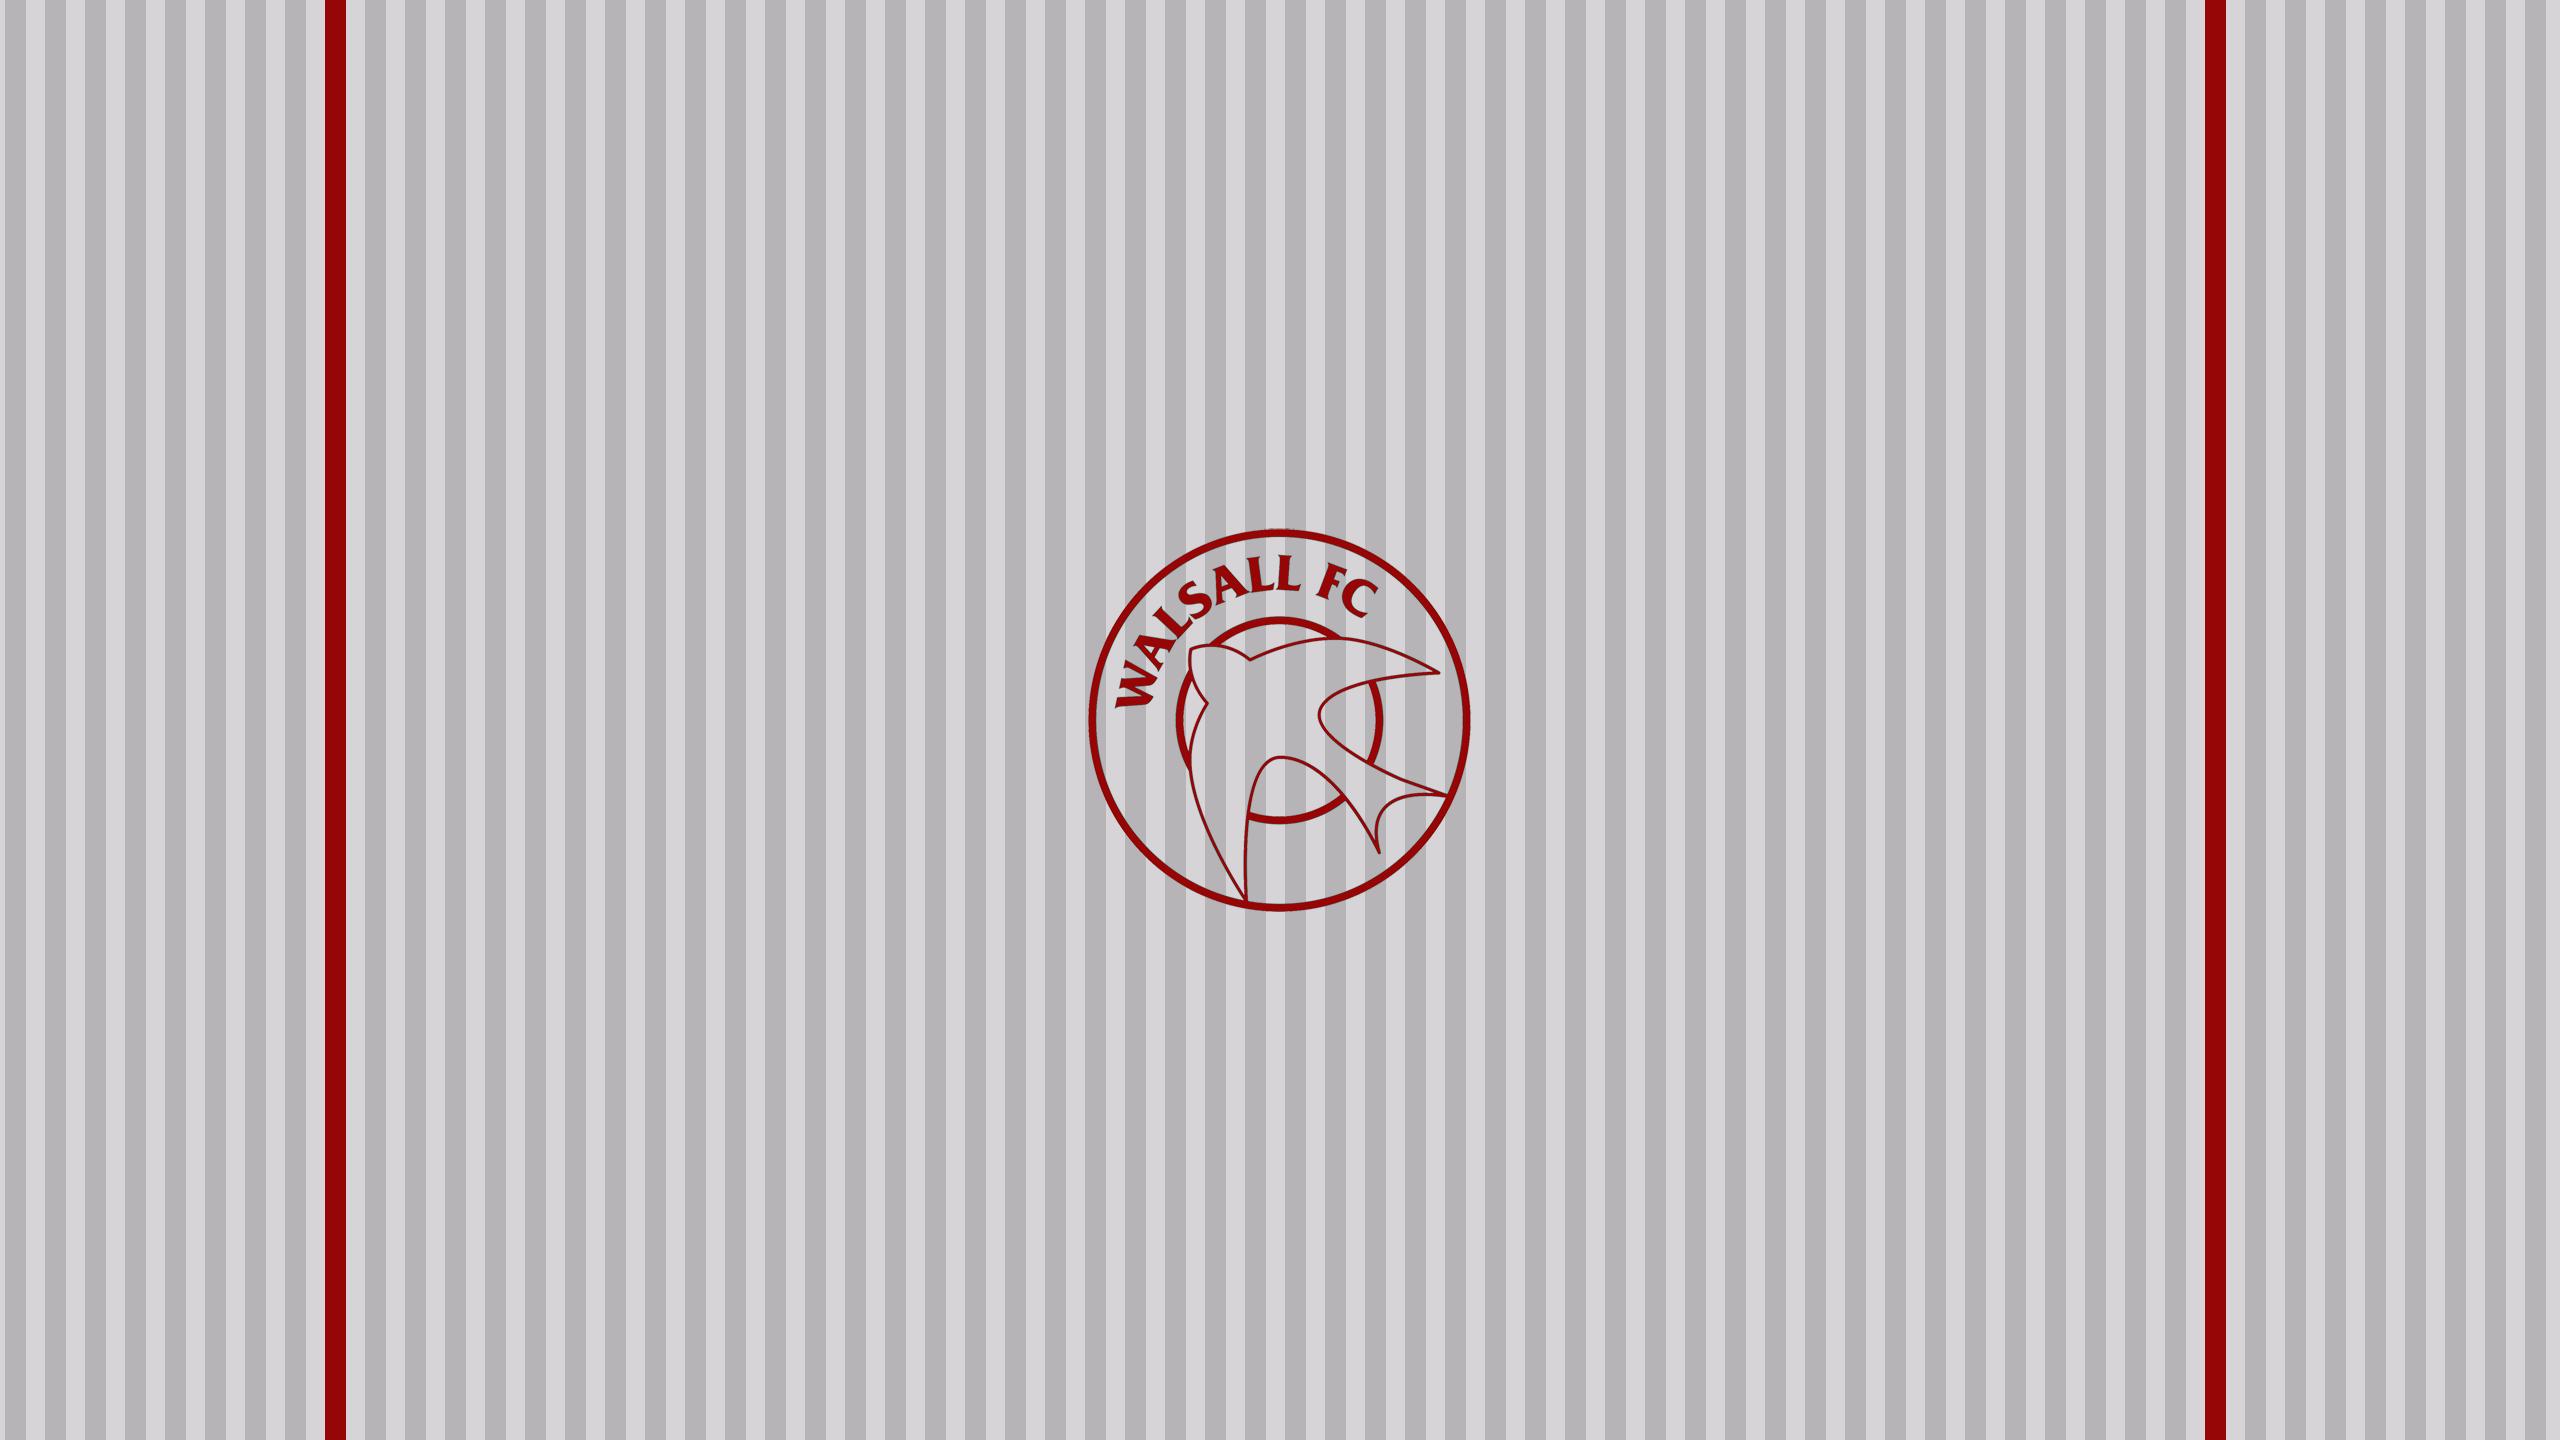 Walsall FC (Away)